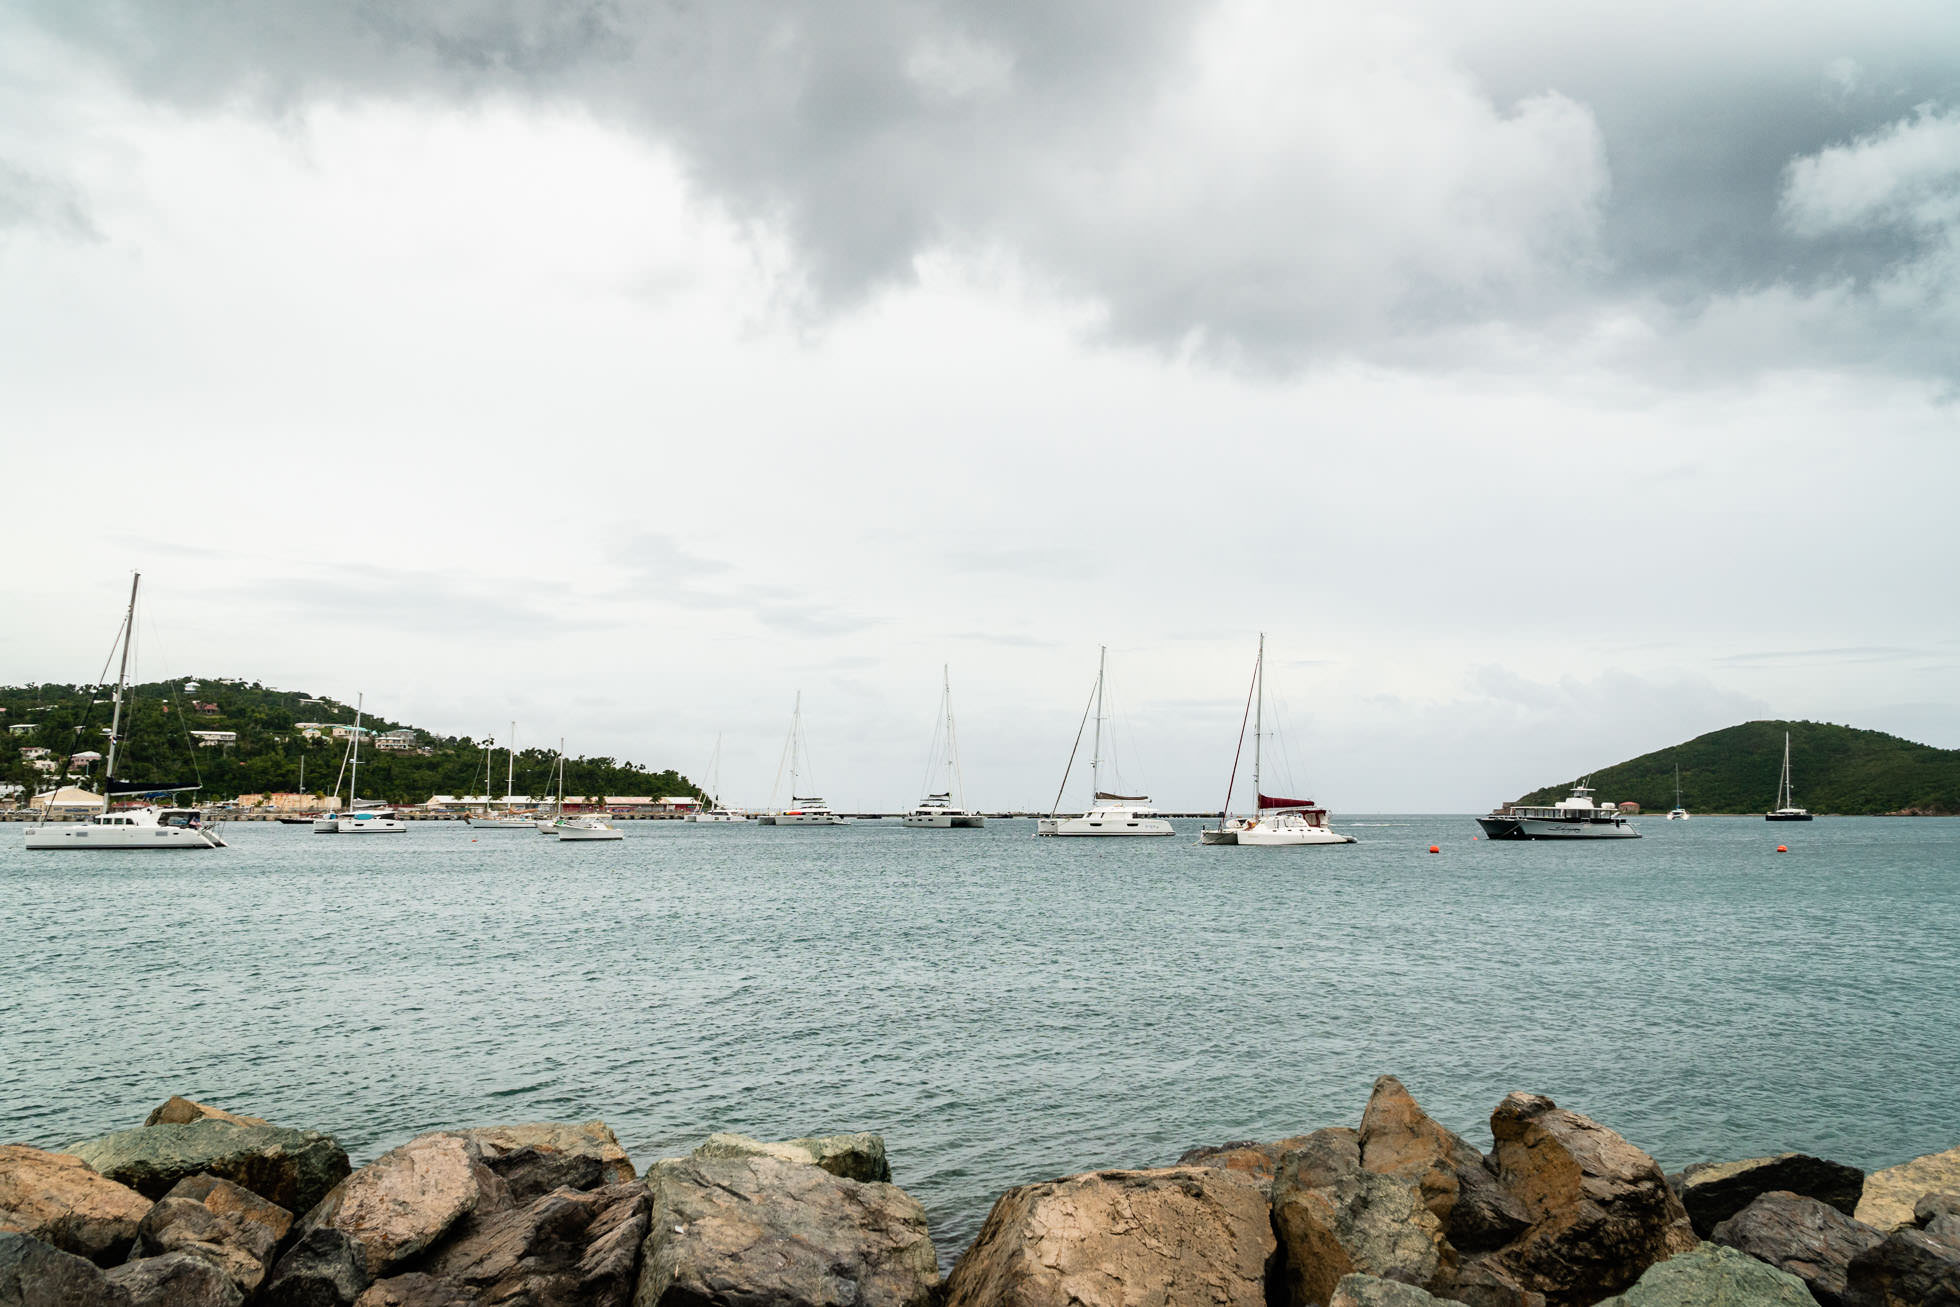 st thomas, frenchman bay, united states virgin islands, cruise harbor